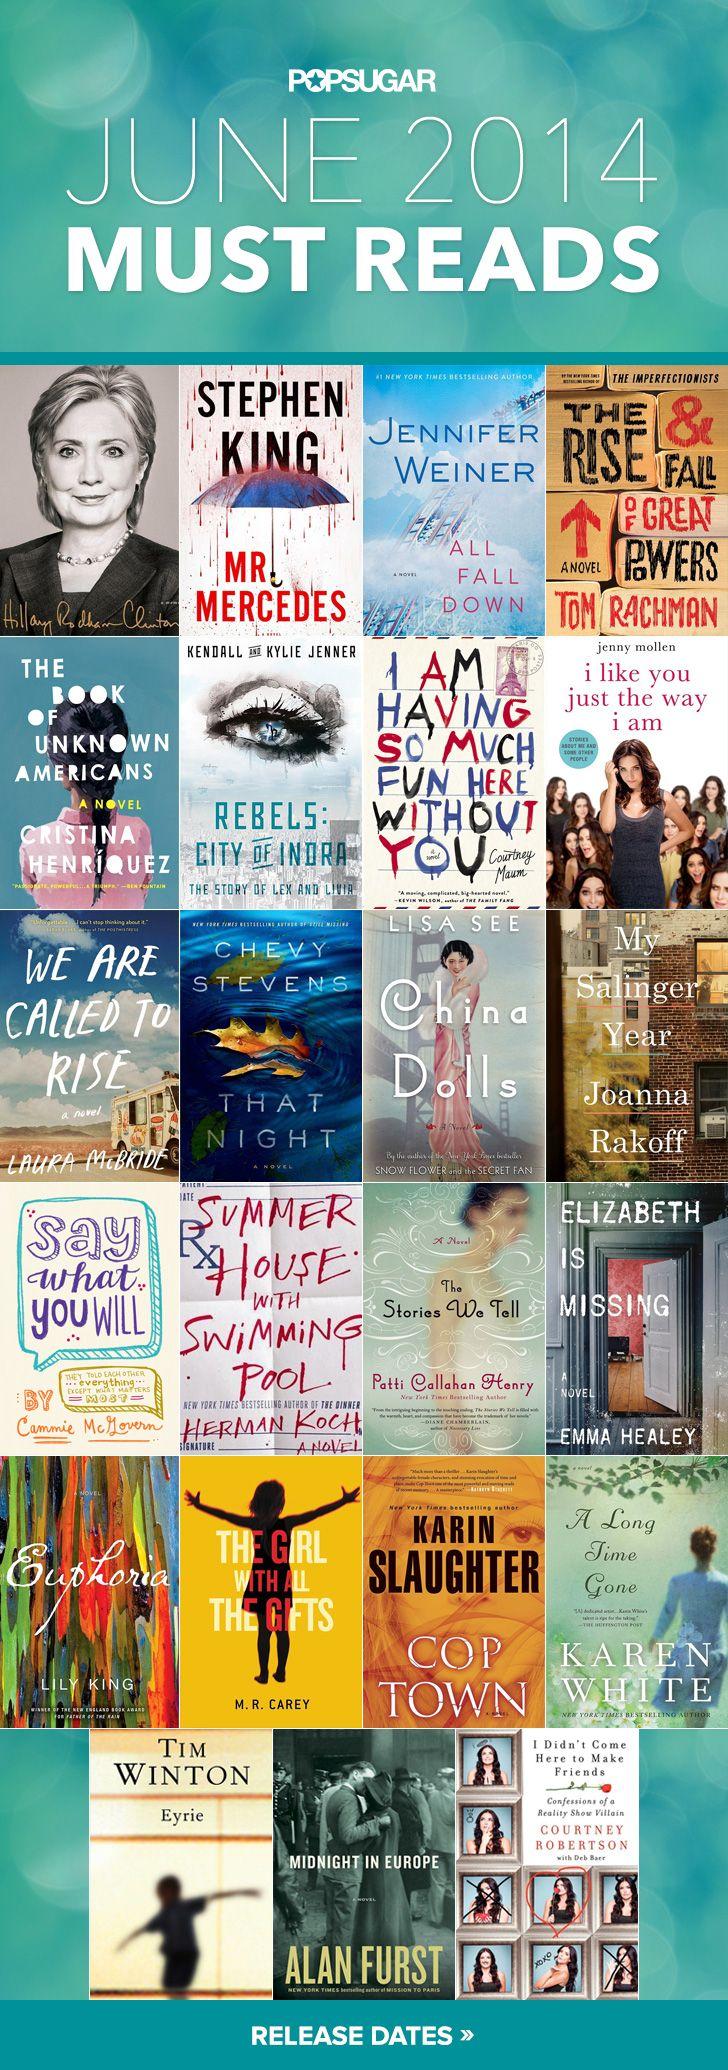 June Must Reads